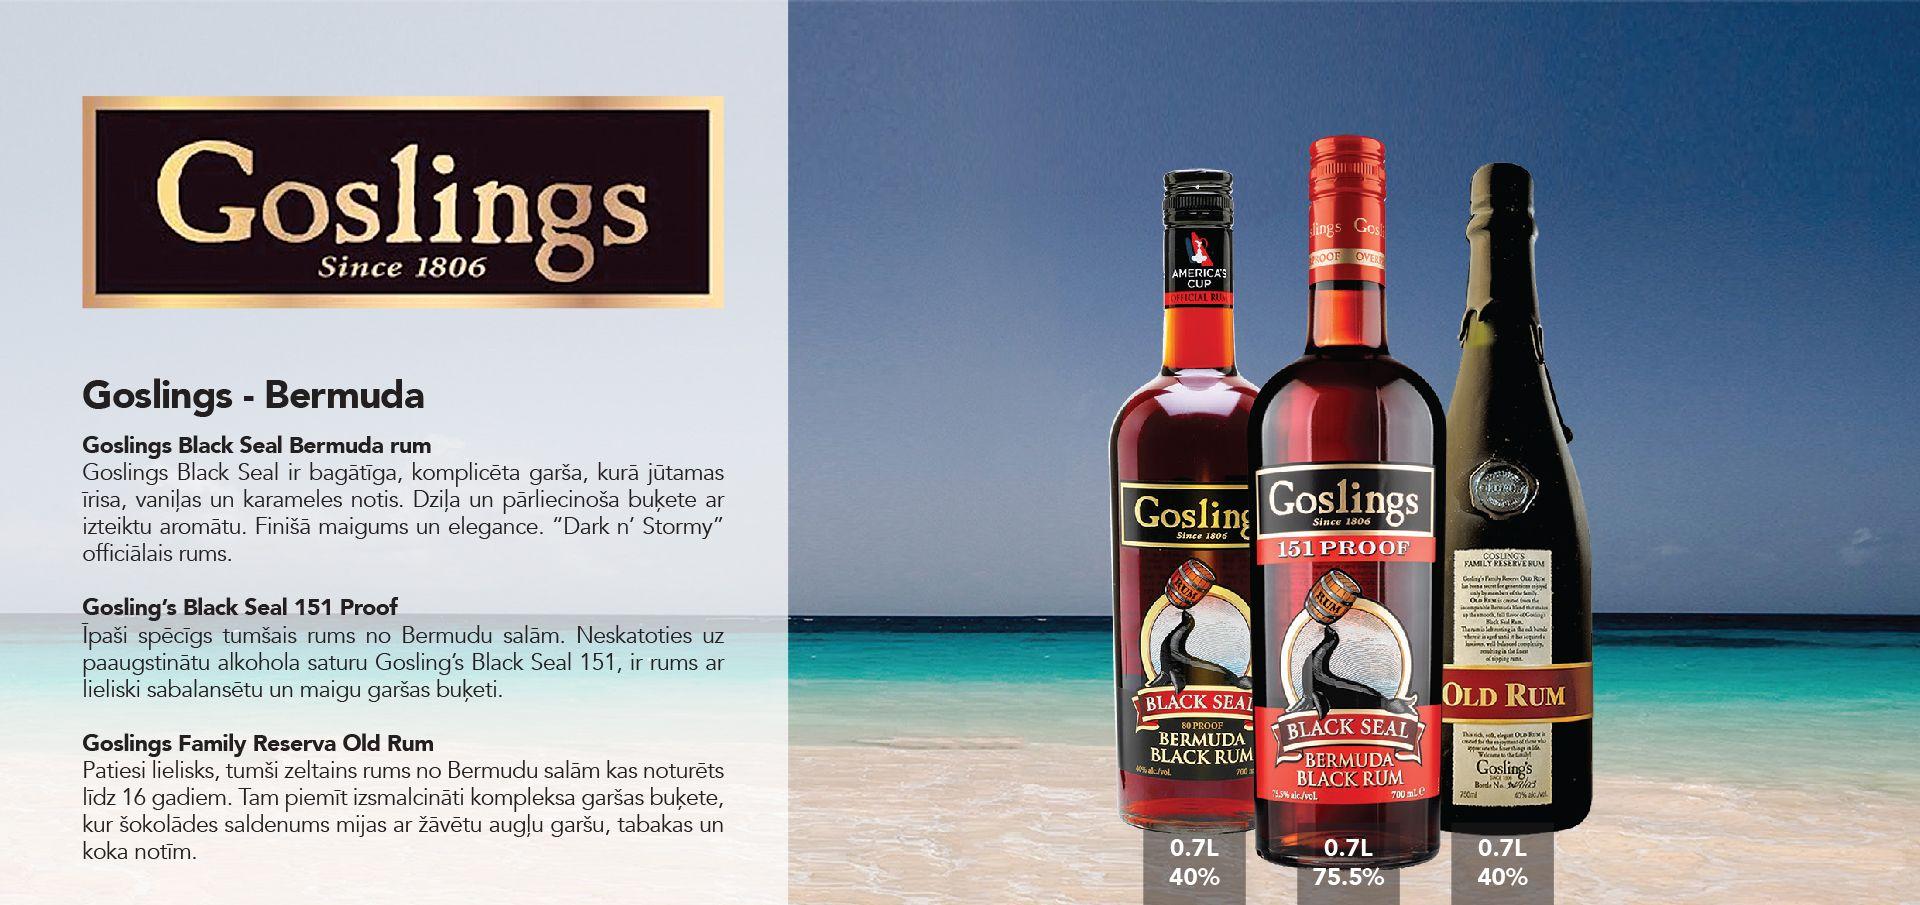 Goslings Rum - Bermuda